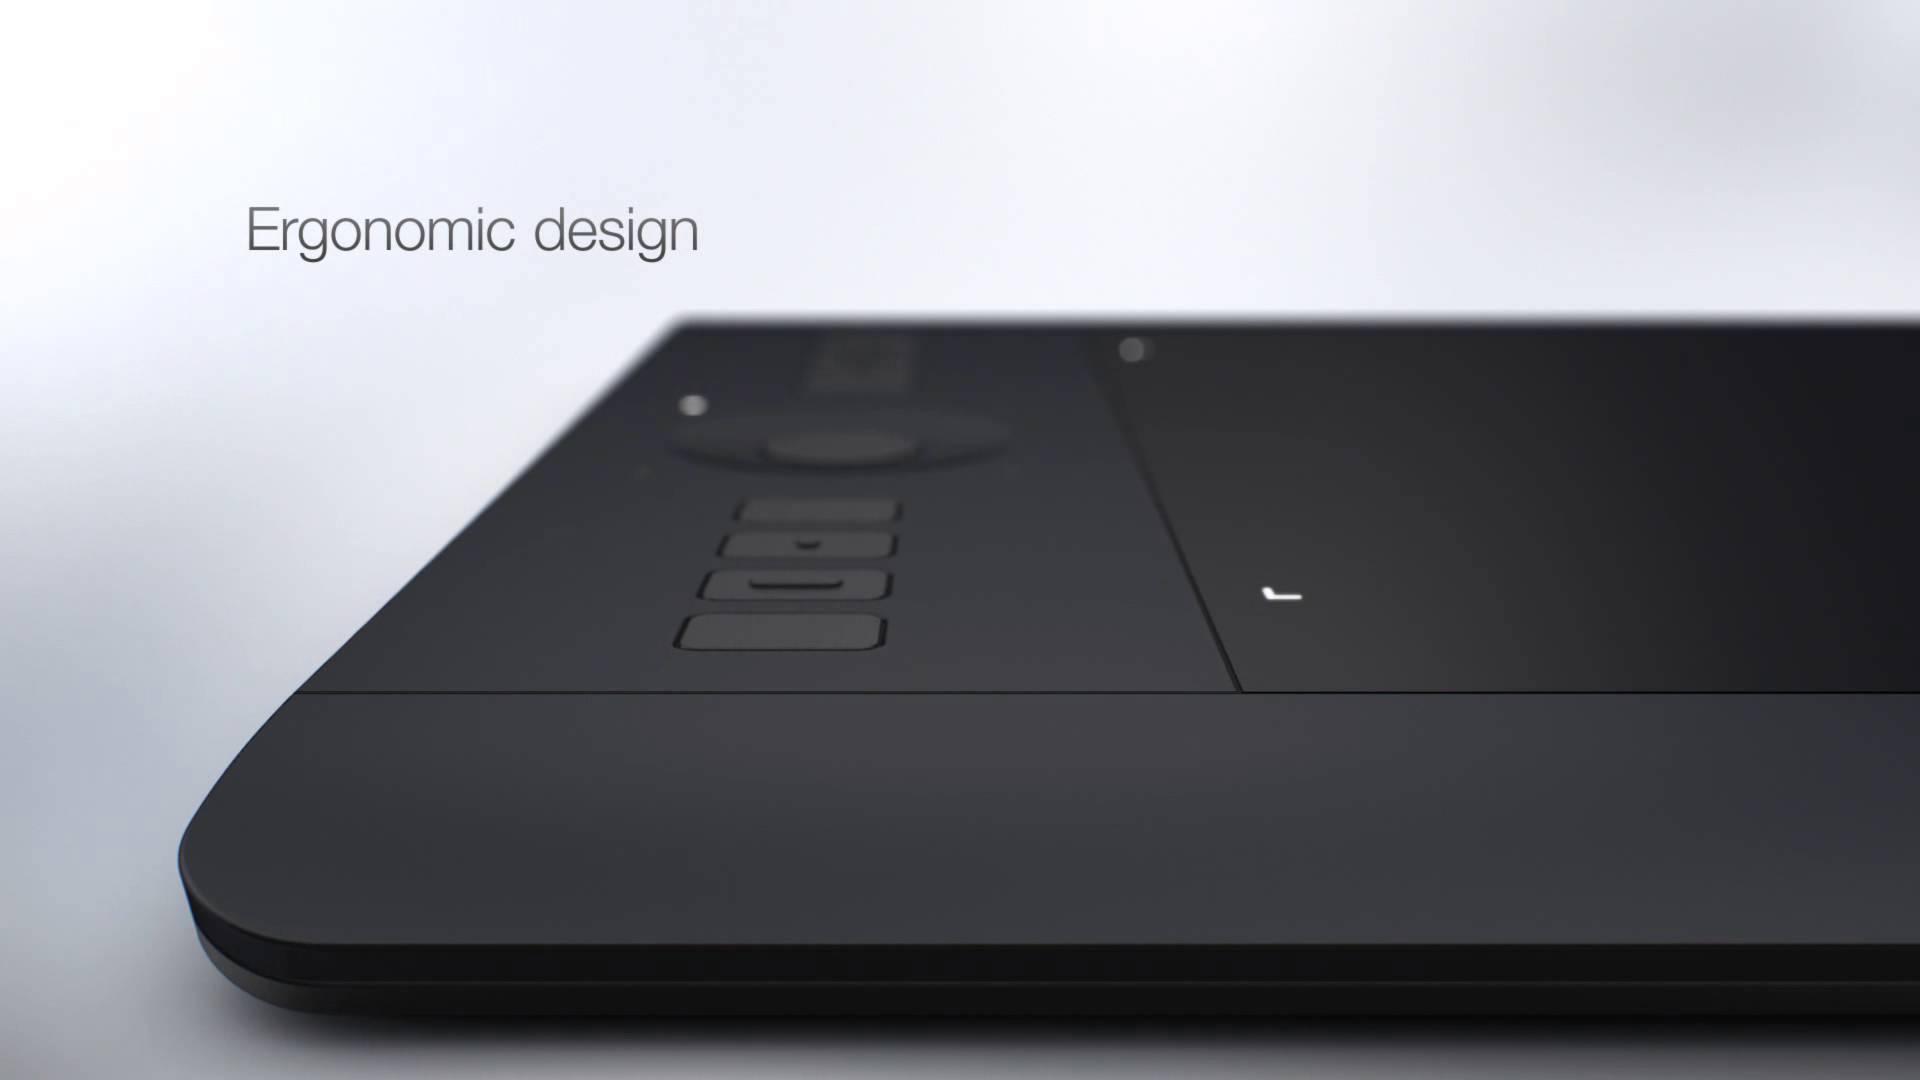 Wacom Intuos Pro Medium Pen & Touch Tablet